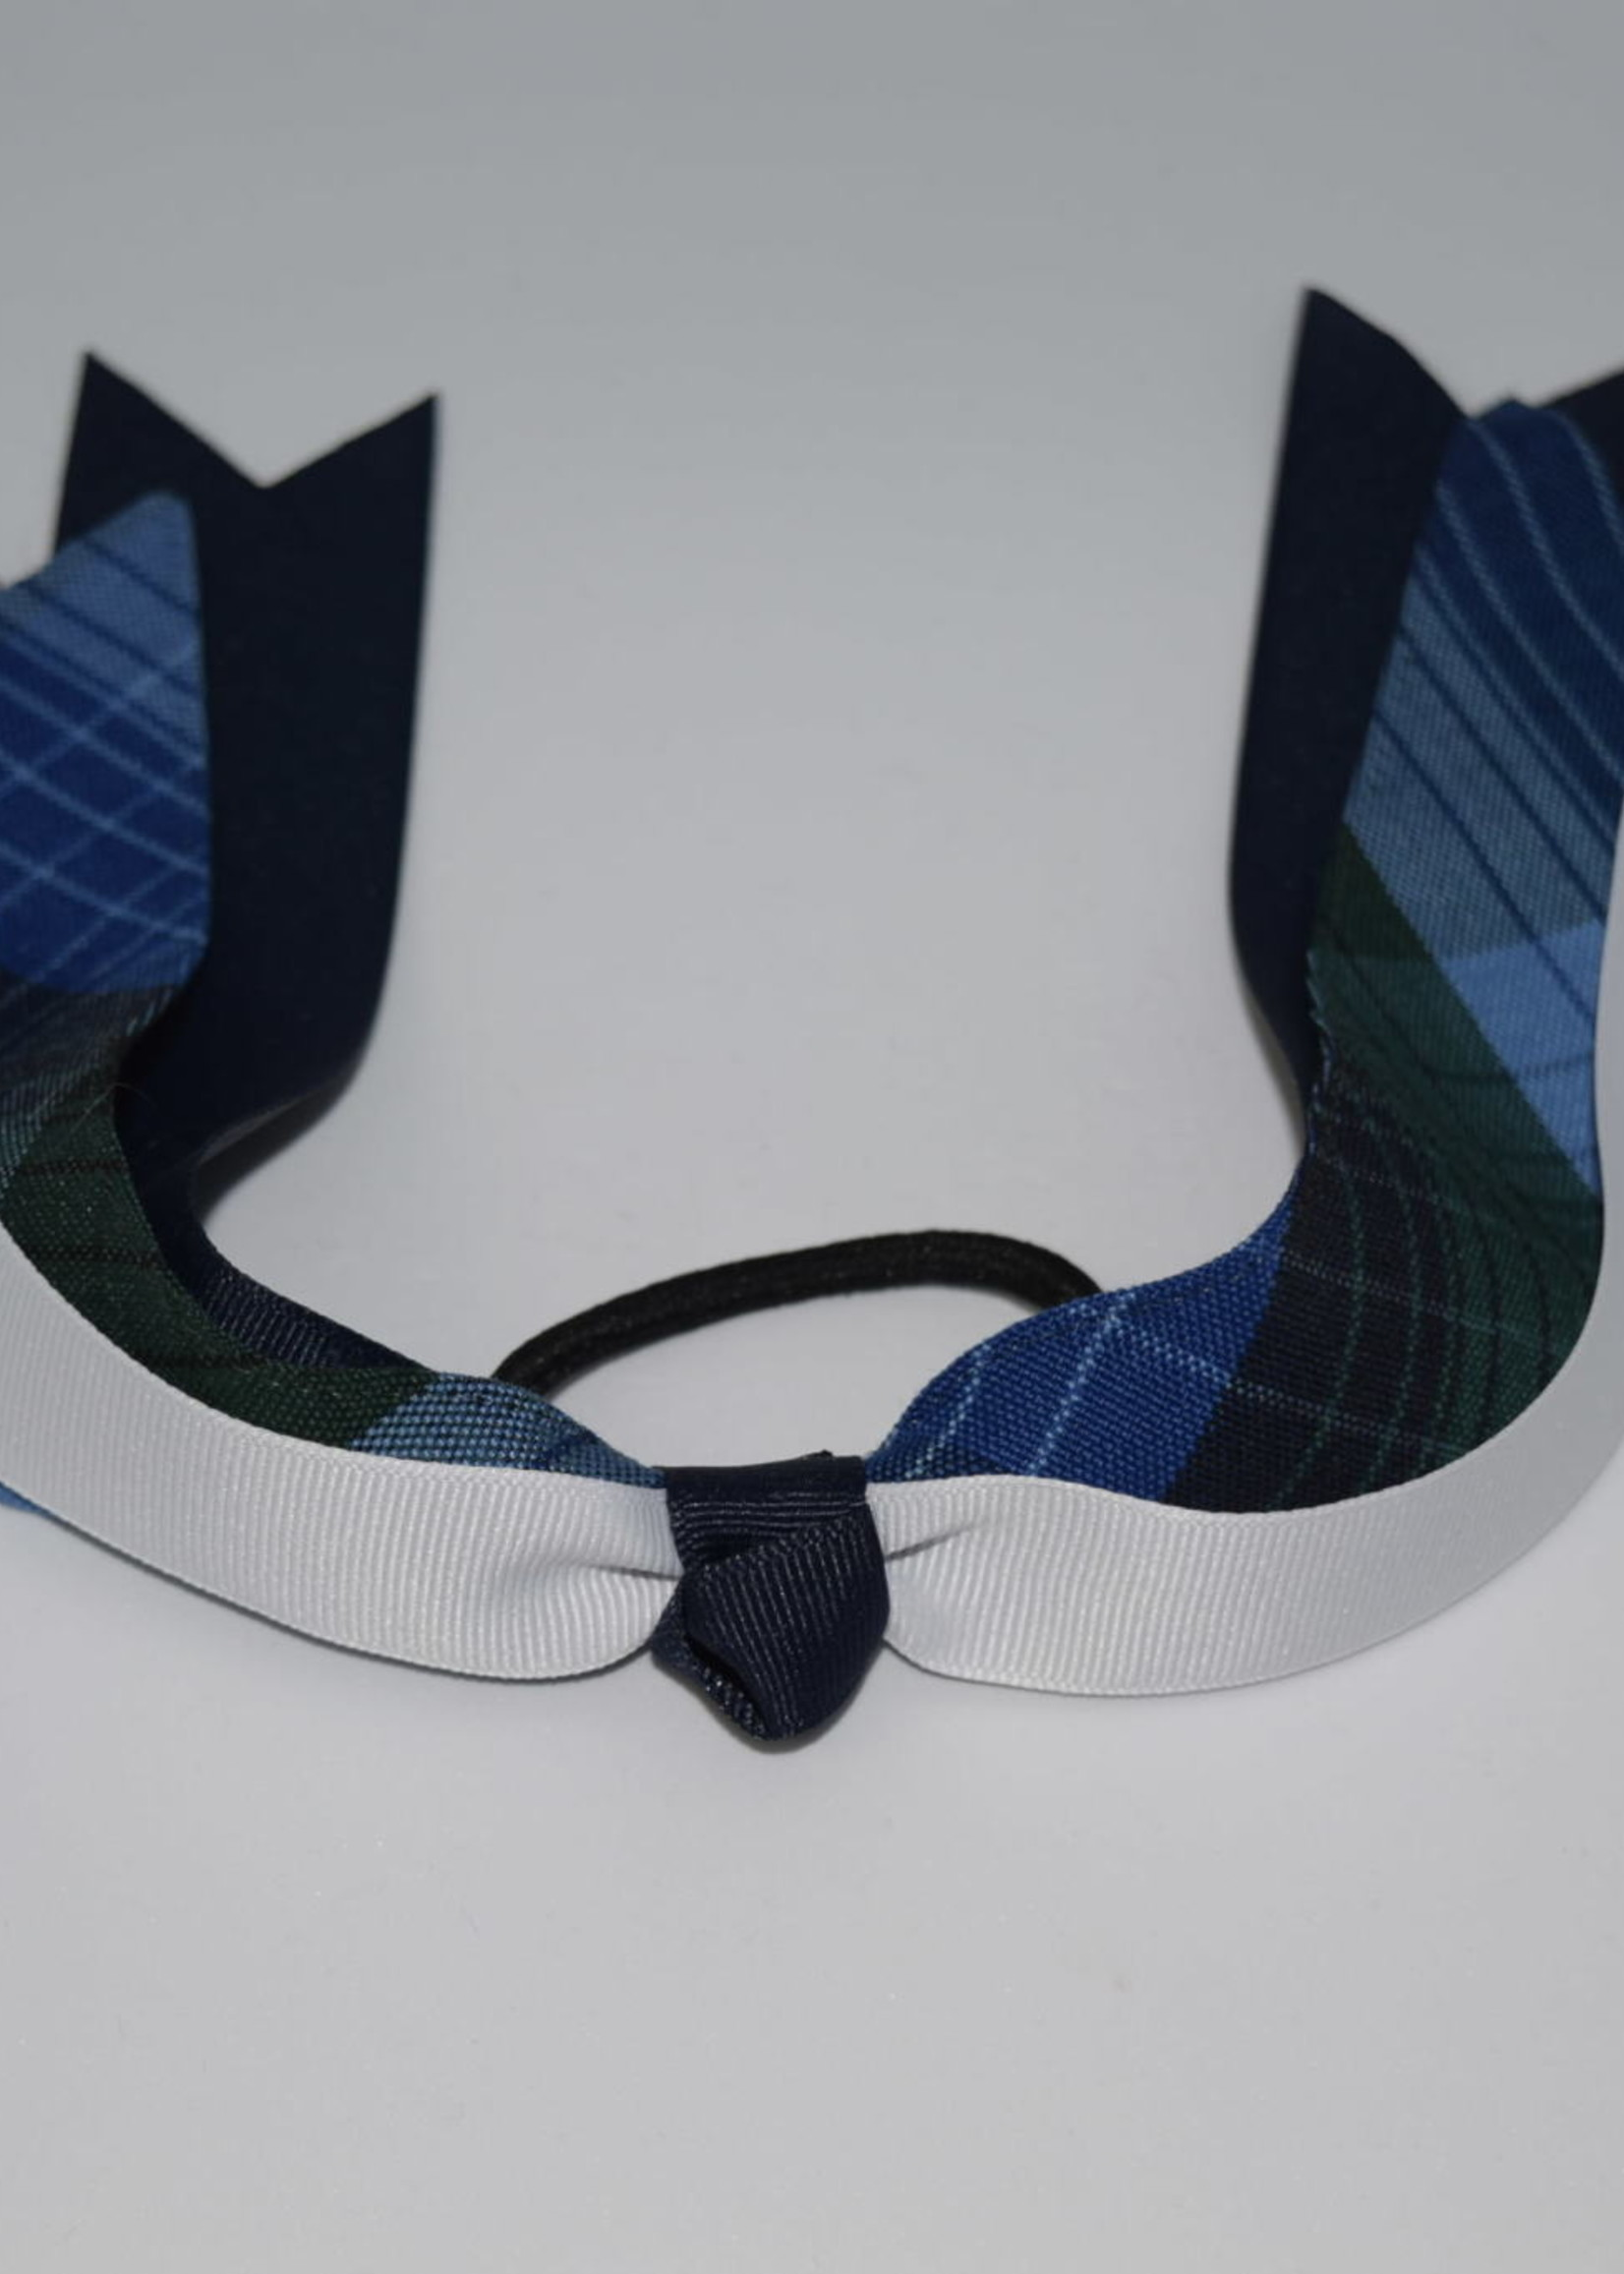 EDT Wide Plaid & Grosgrain Ribbon Streamer Bow P46 NVY WHT